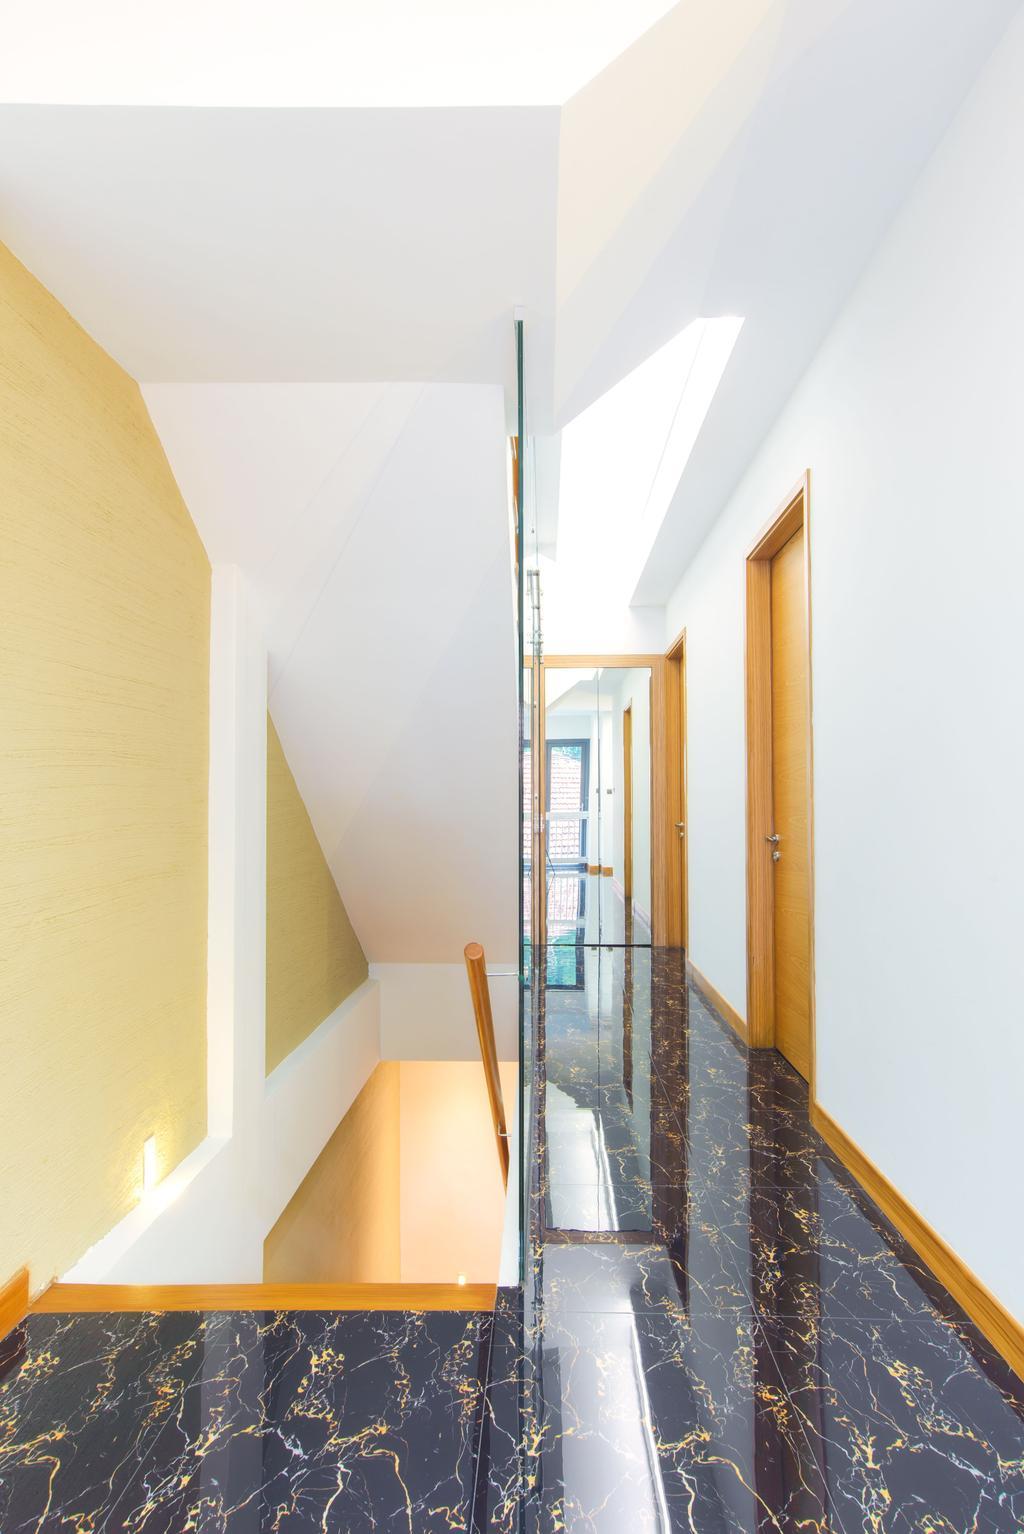 Contemporary, Landed, 57 Seraya Crescent, Architect, FOMA Architects, Indoors, Interior Design, Jar, Pottery, Vase, Banister, Handrail